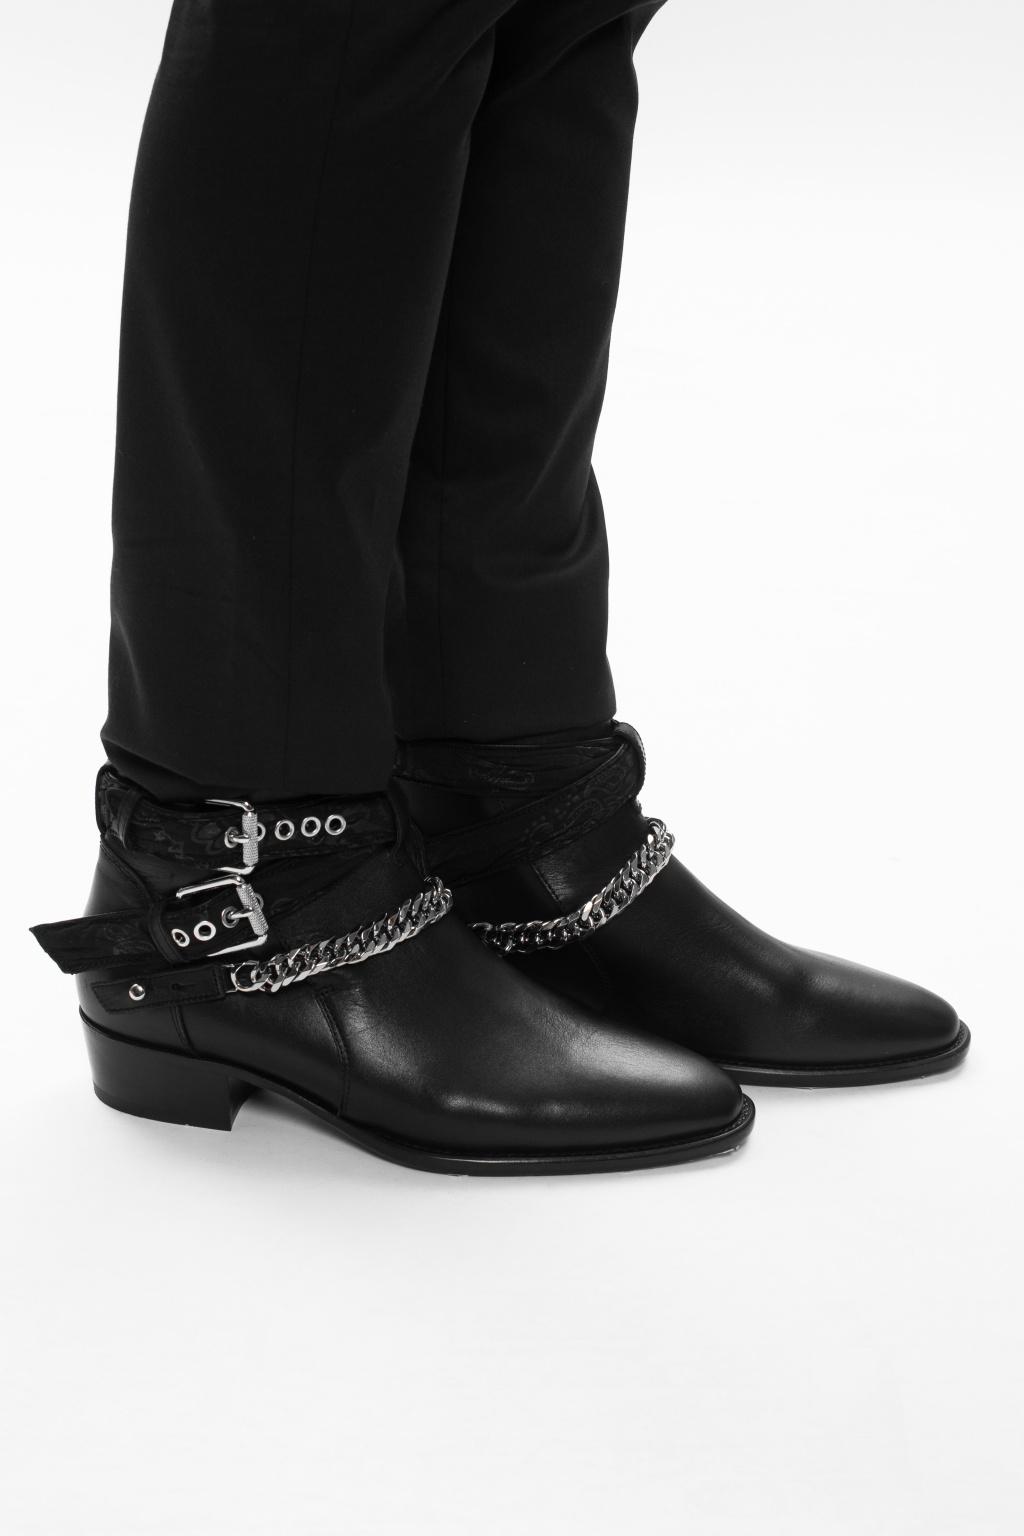 Amiri 'Bandana' ankle boots